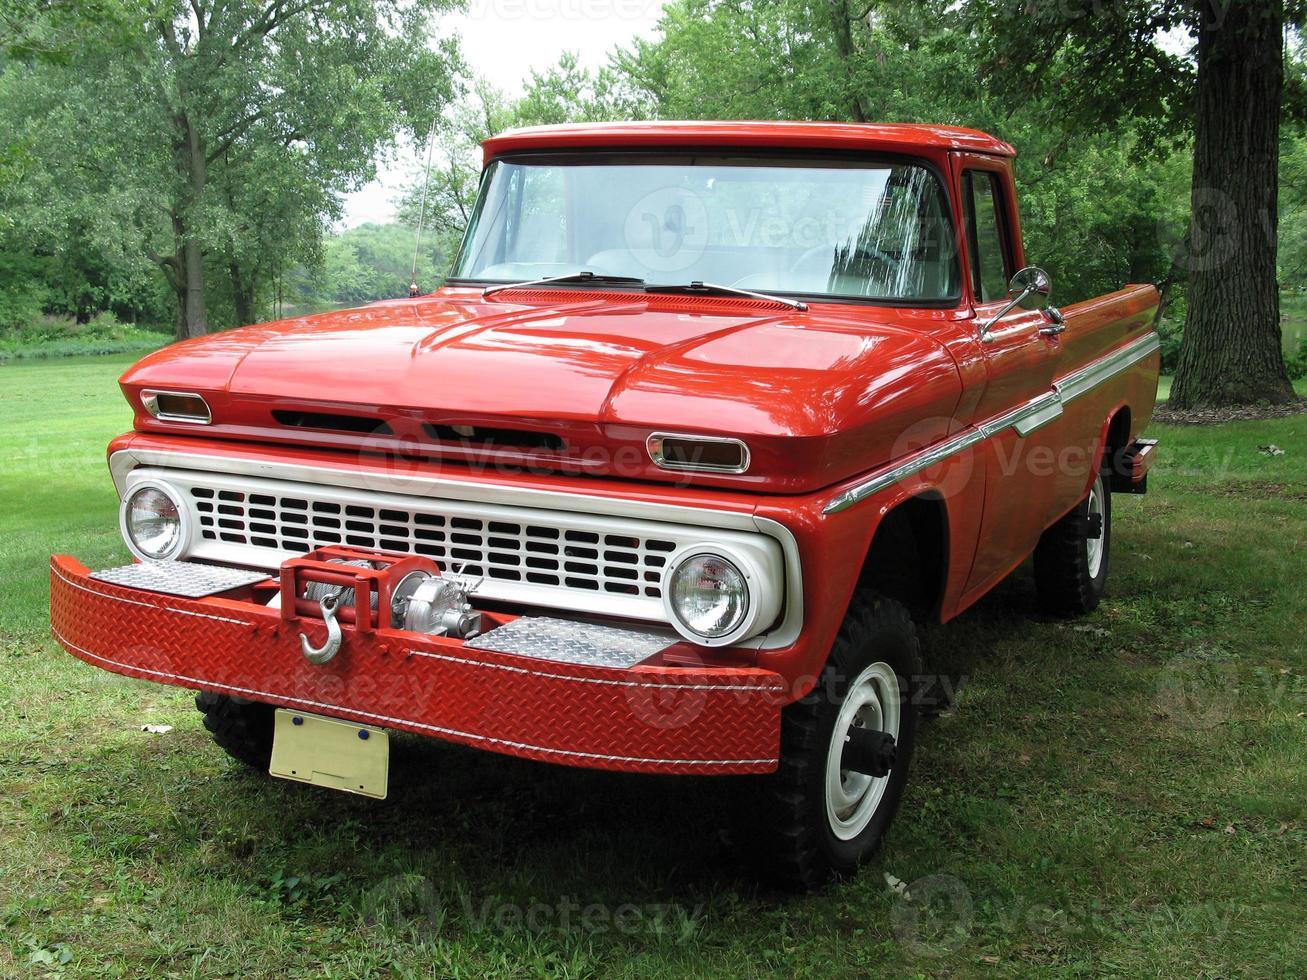 Big red pickup truck photo